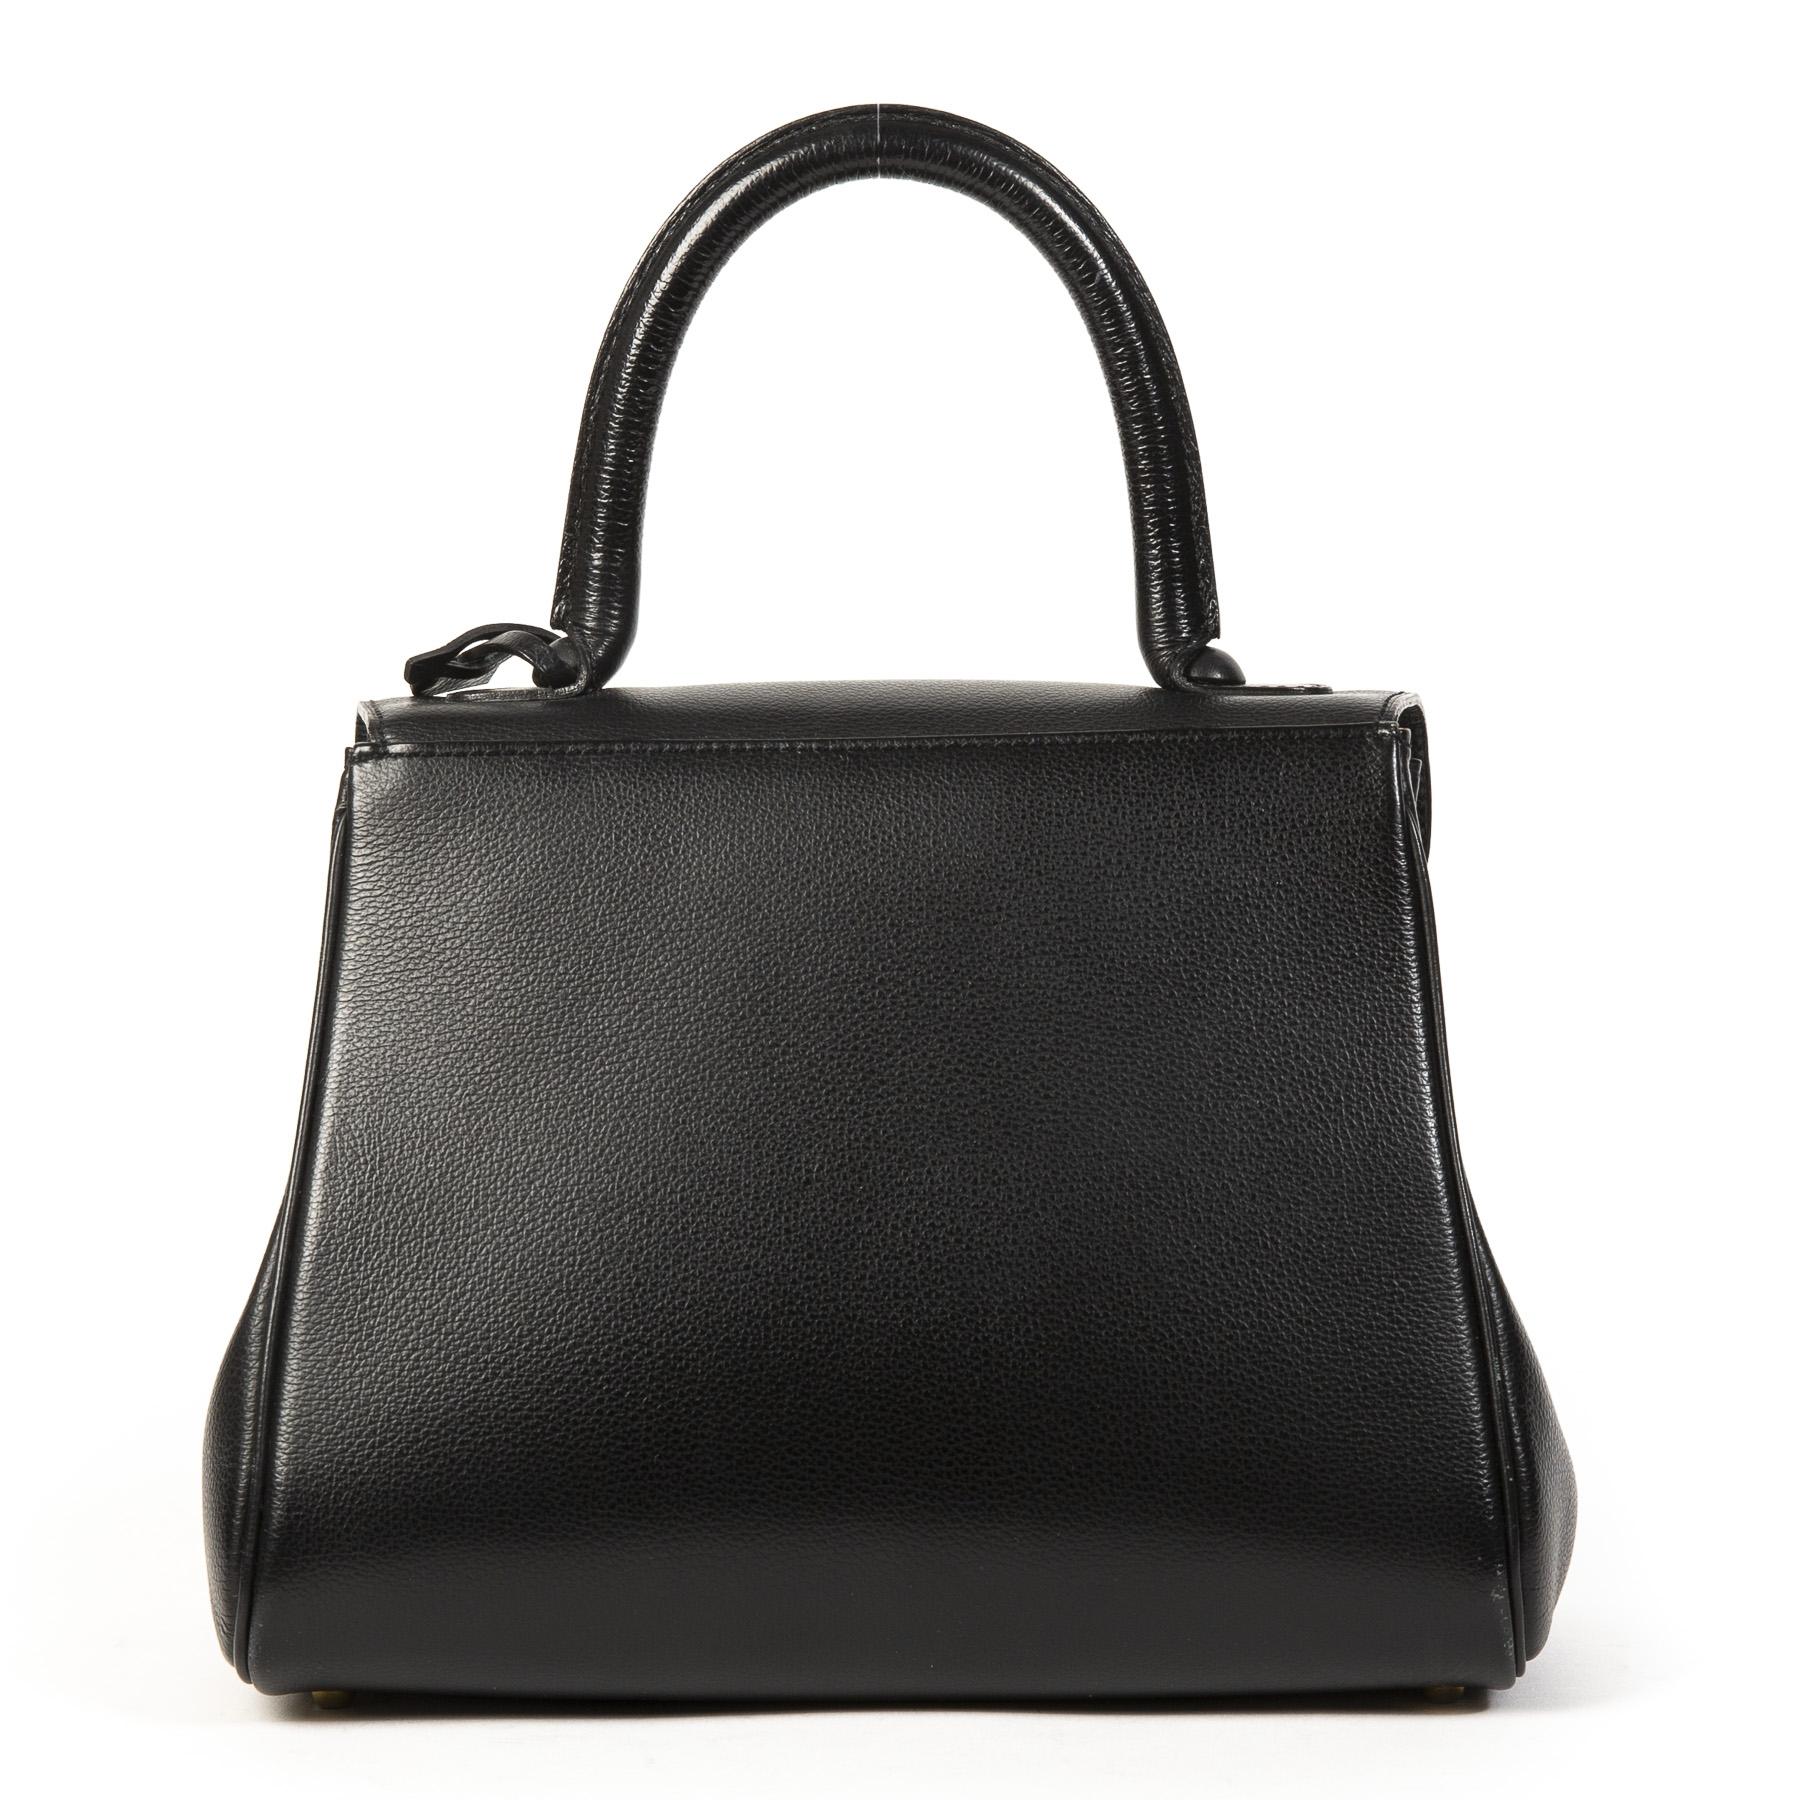 1f67e1449 ... Labellov We buy and sell your authentic designer Delvaux Black Brillant  PM GHW